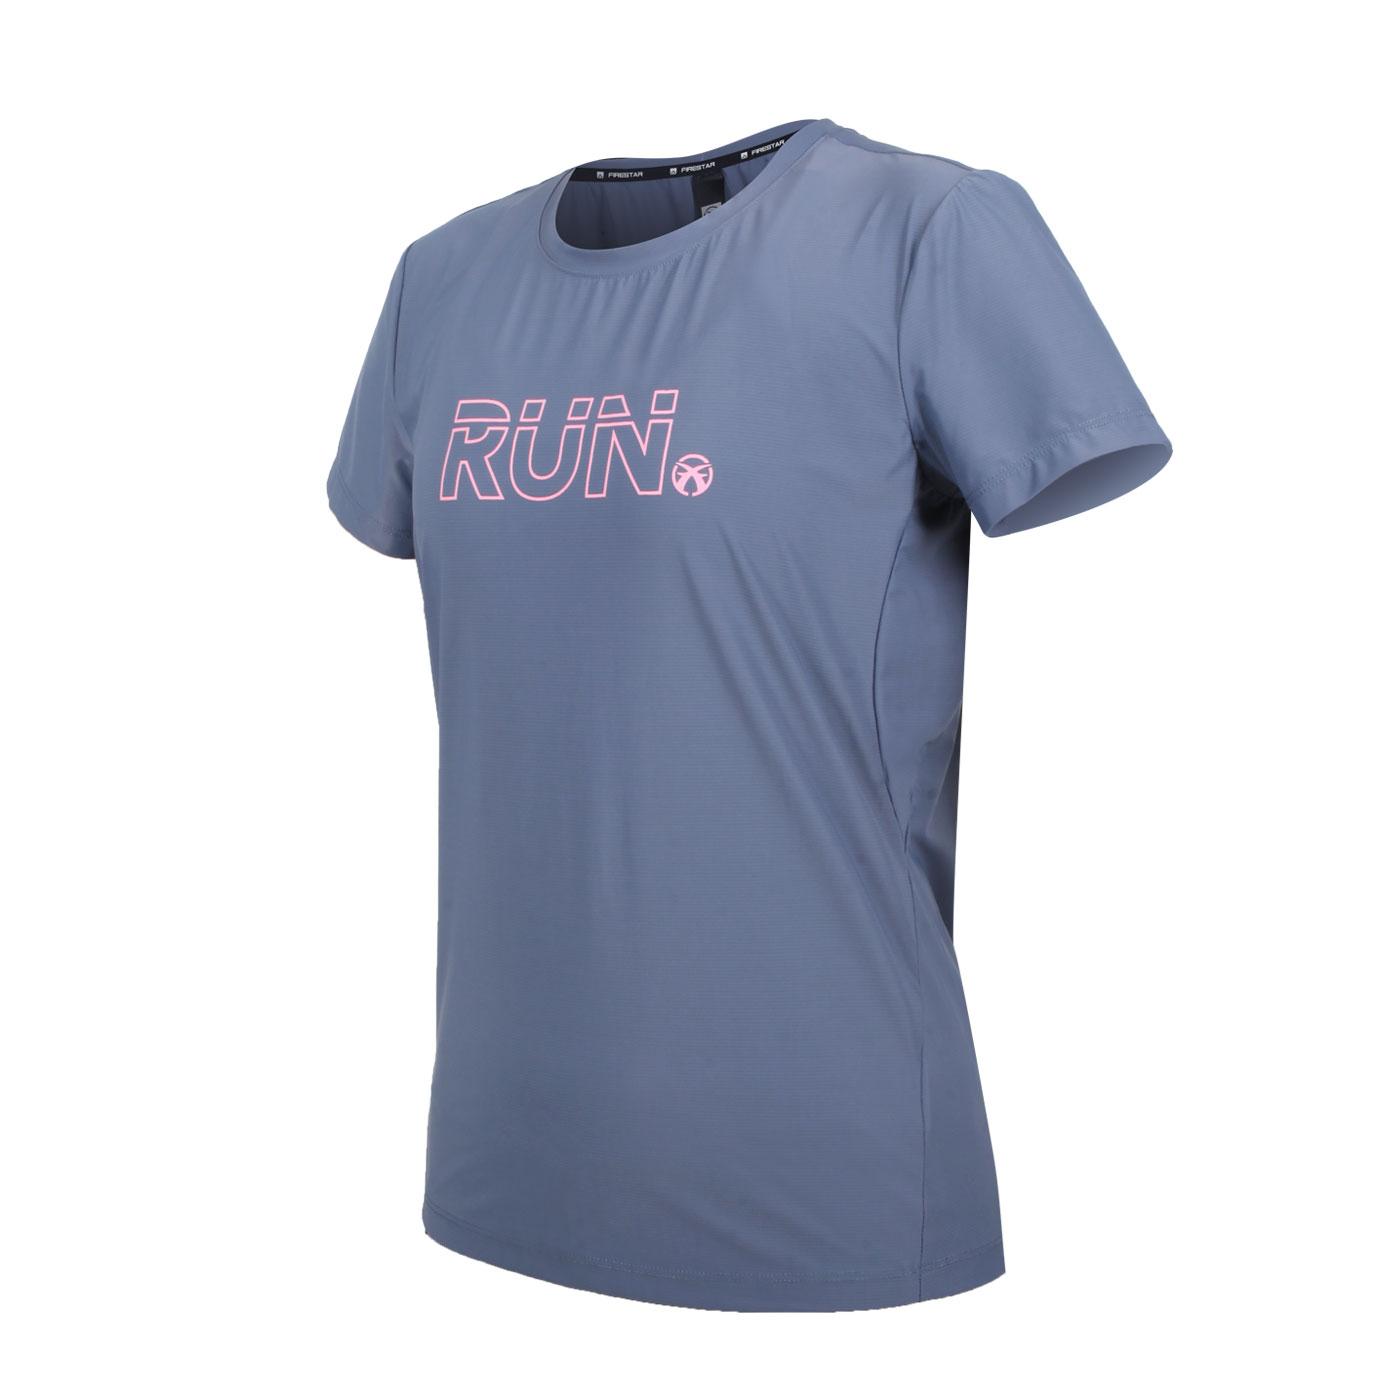 FIRESTAR 女款彈性印花圓領短袖T恤 DL163-13 - 灰紫粉